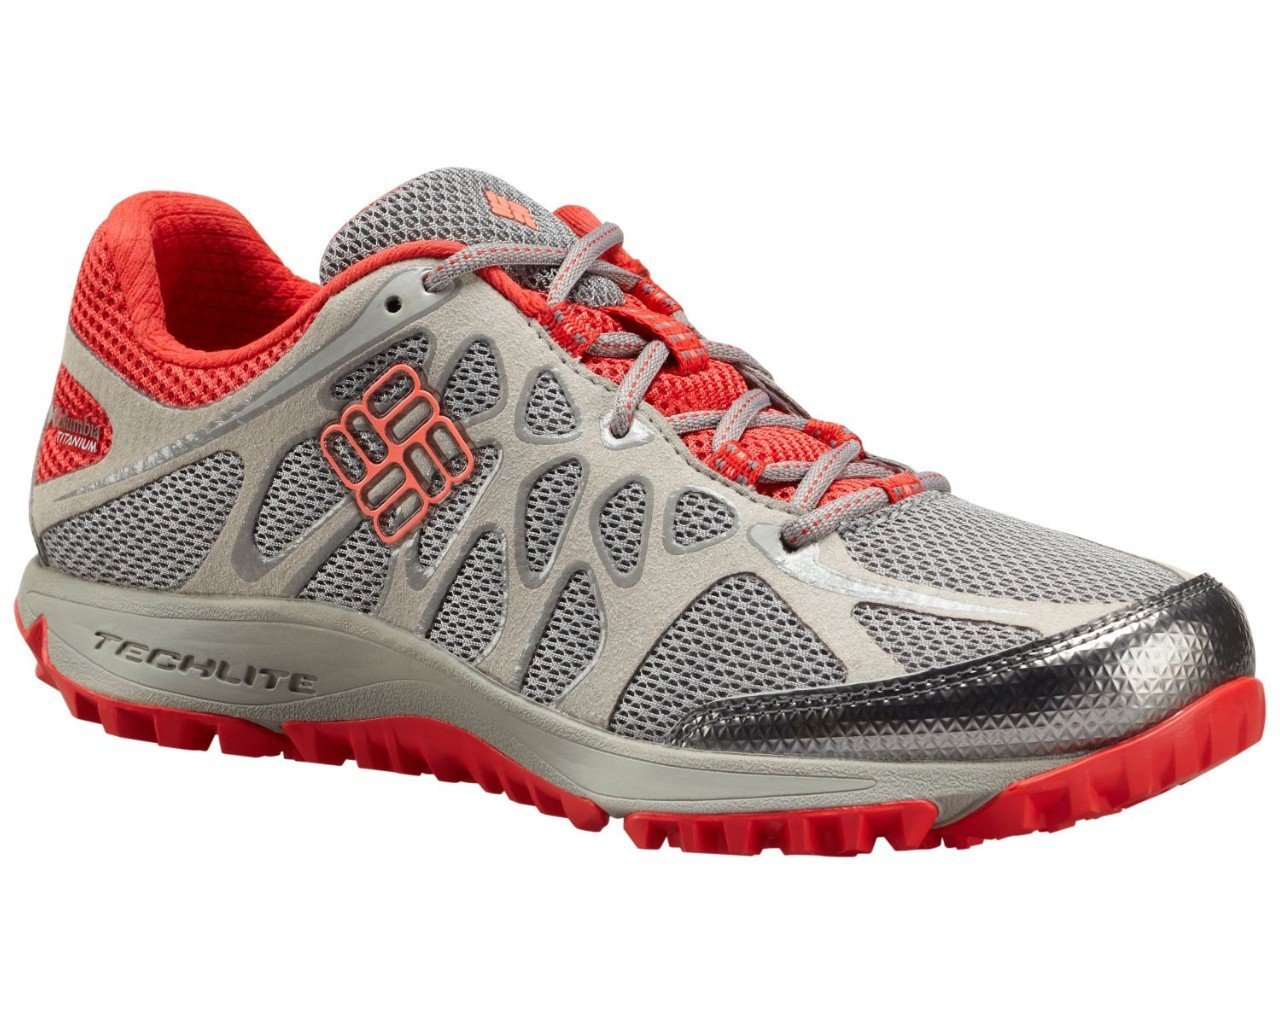 Columbia Women's Conspiracy Titanium Trail Outdoor Sneakers, Grey Mesh, 8.5 M